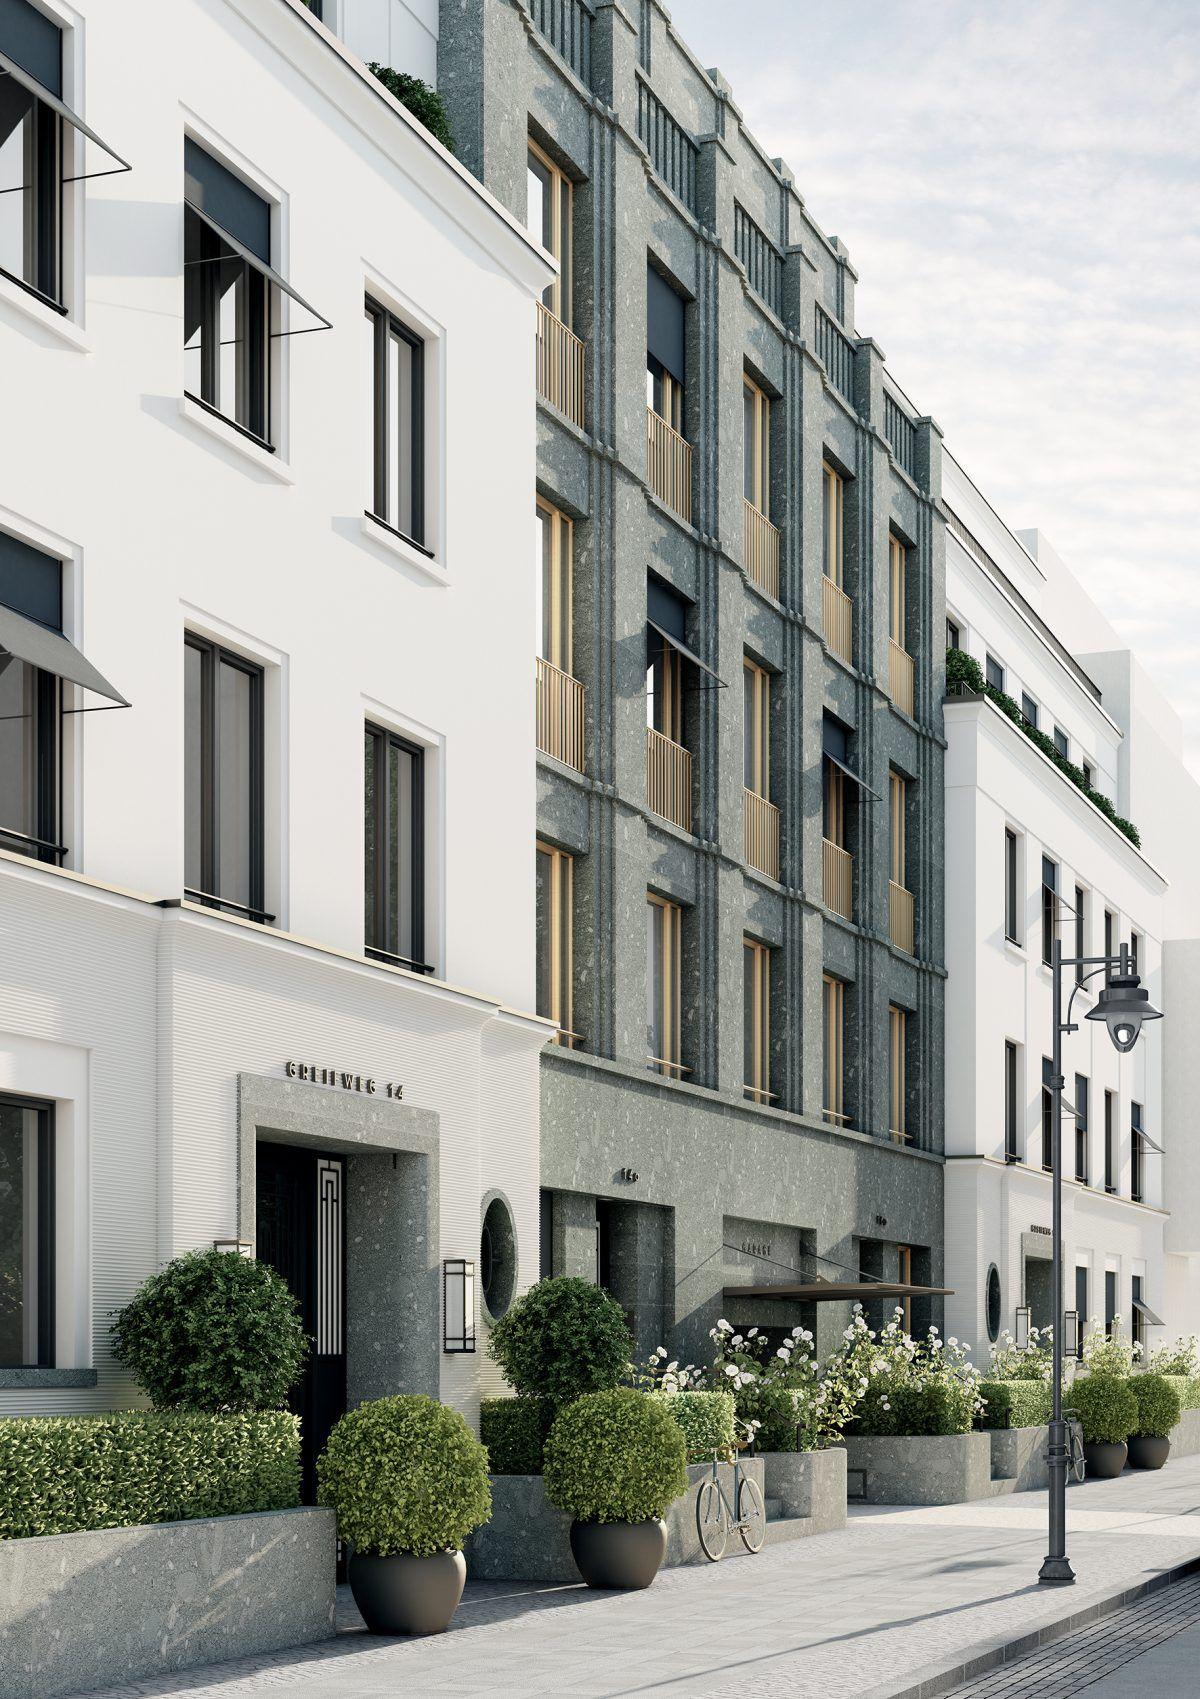 Greifweg Immobilie Düsseldorf Fassade | Cool architecture ...